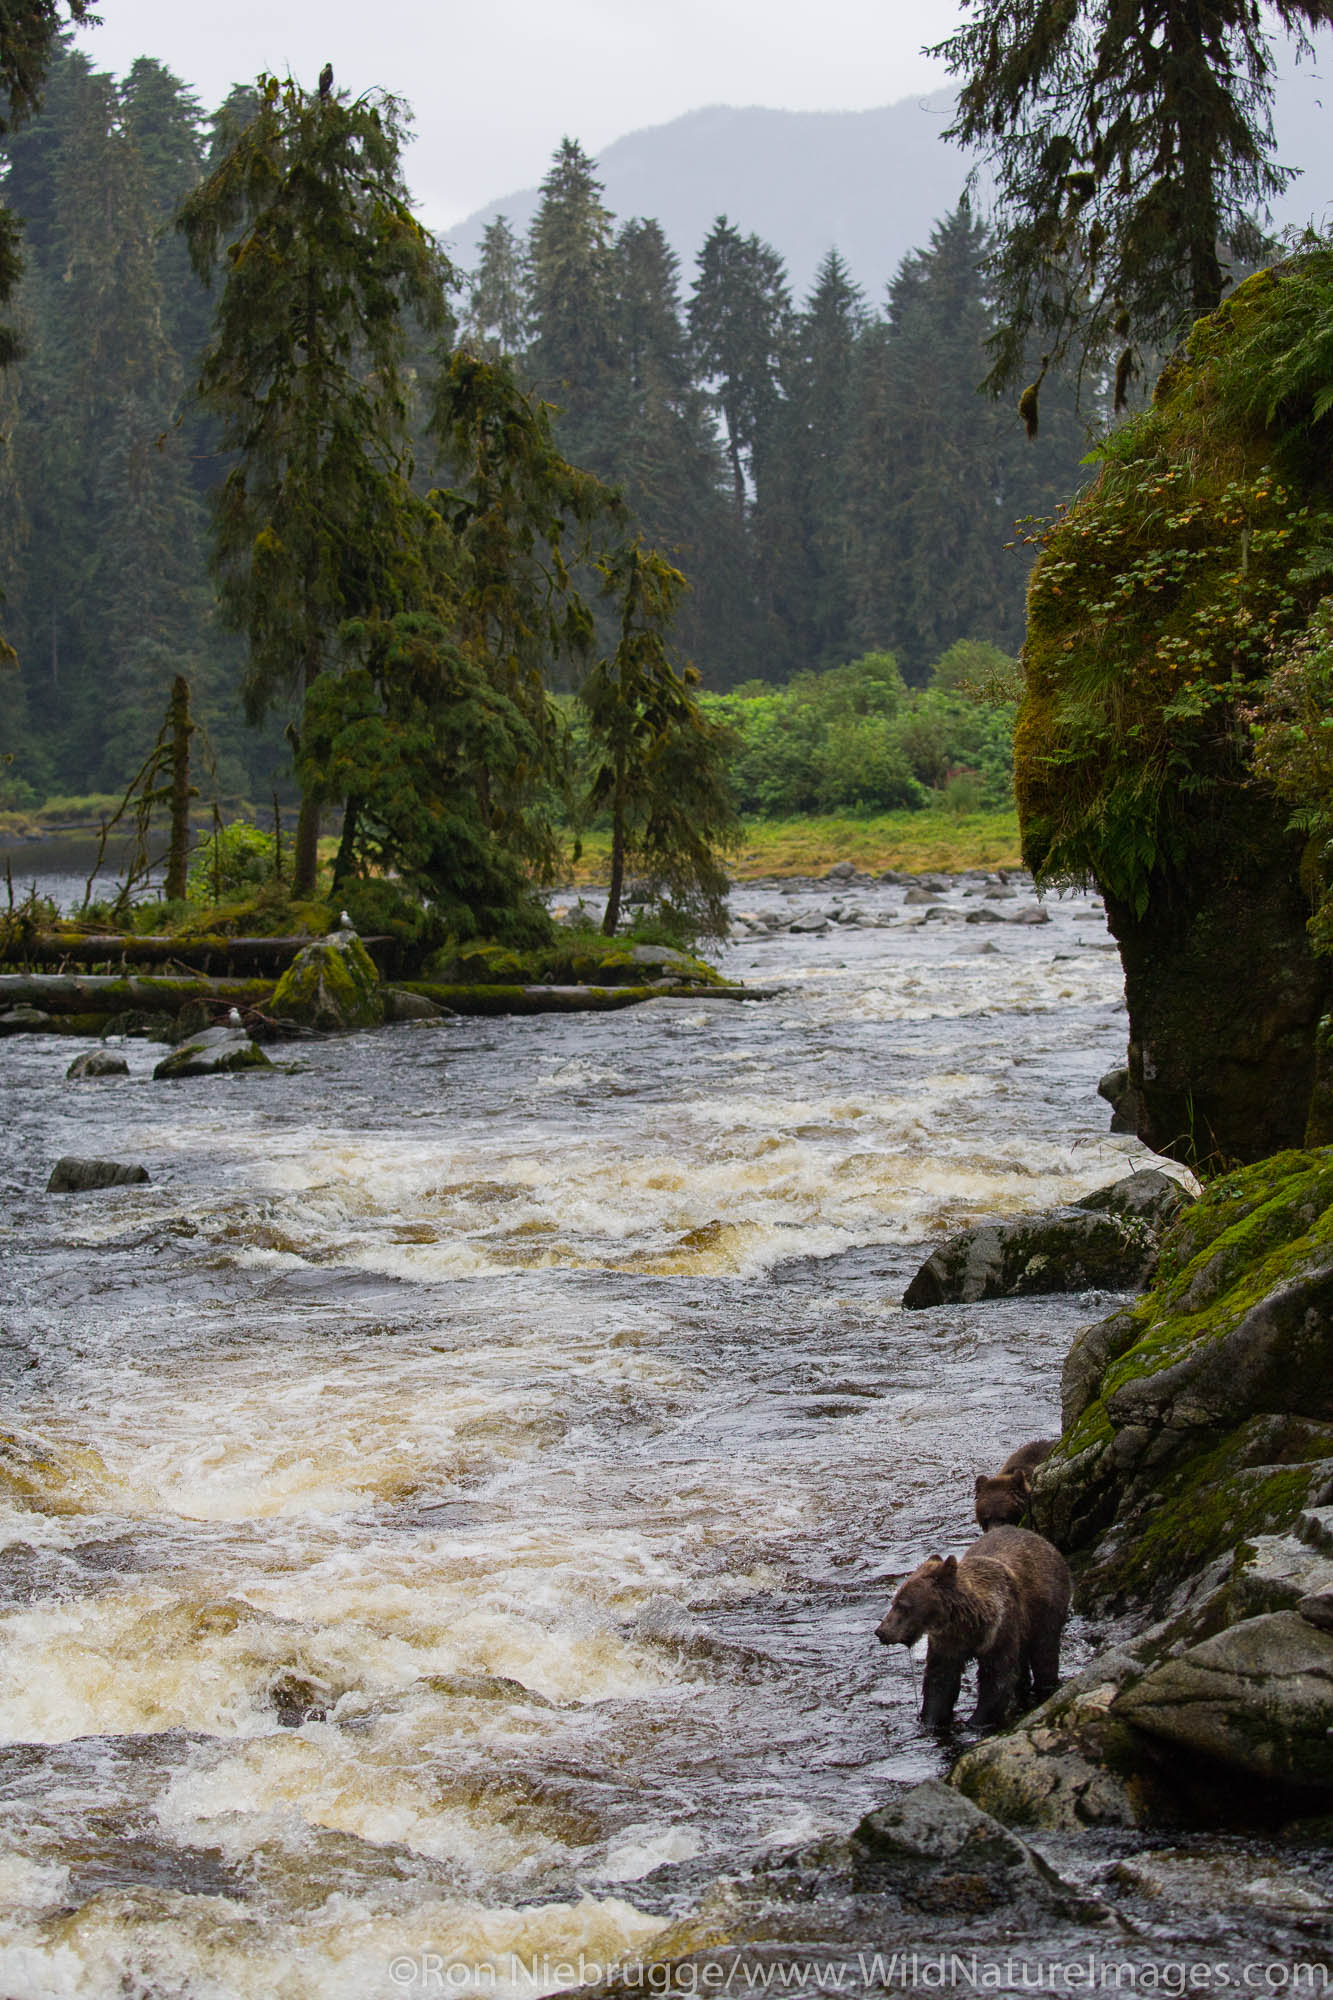 Anan Creek Wildlife Viewing Site, Tongass National Forest, Alaska.